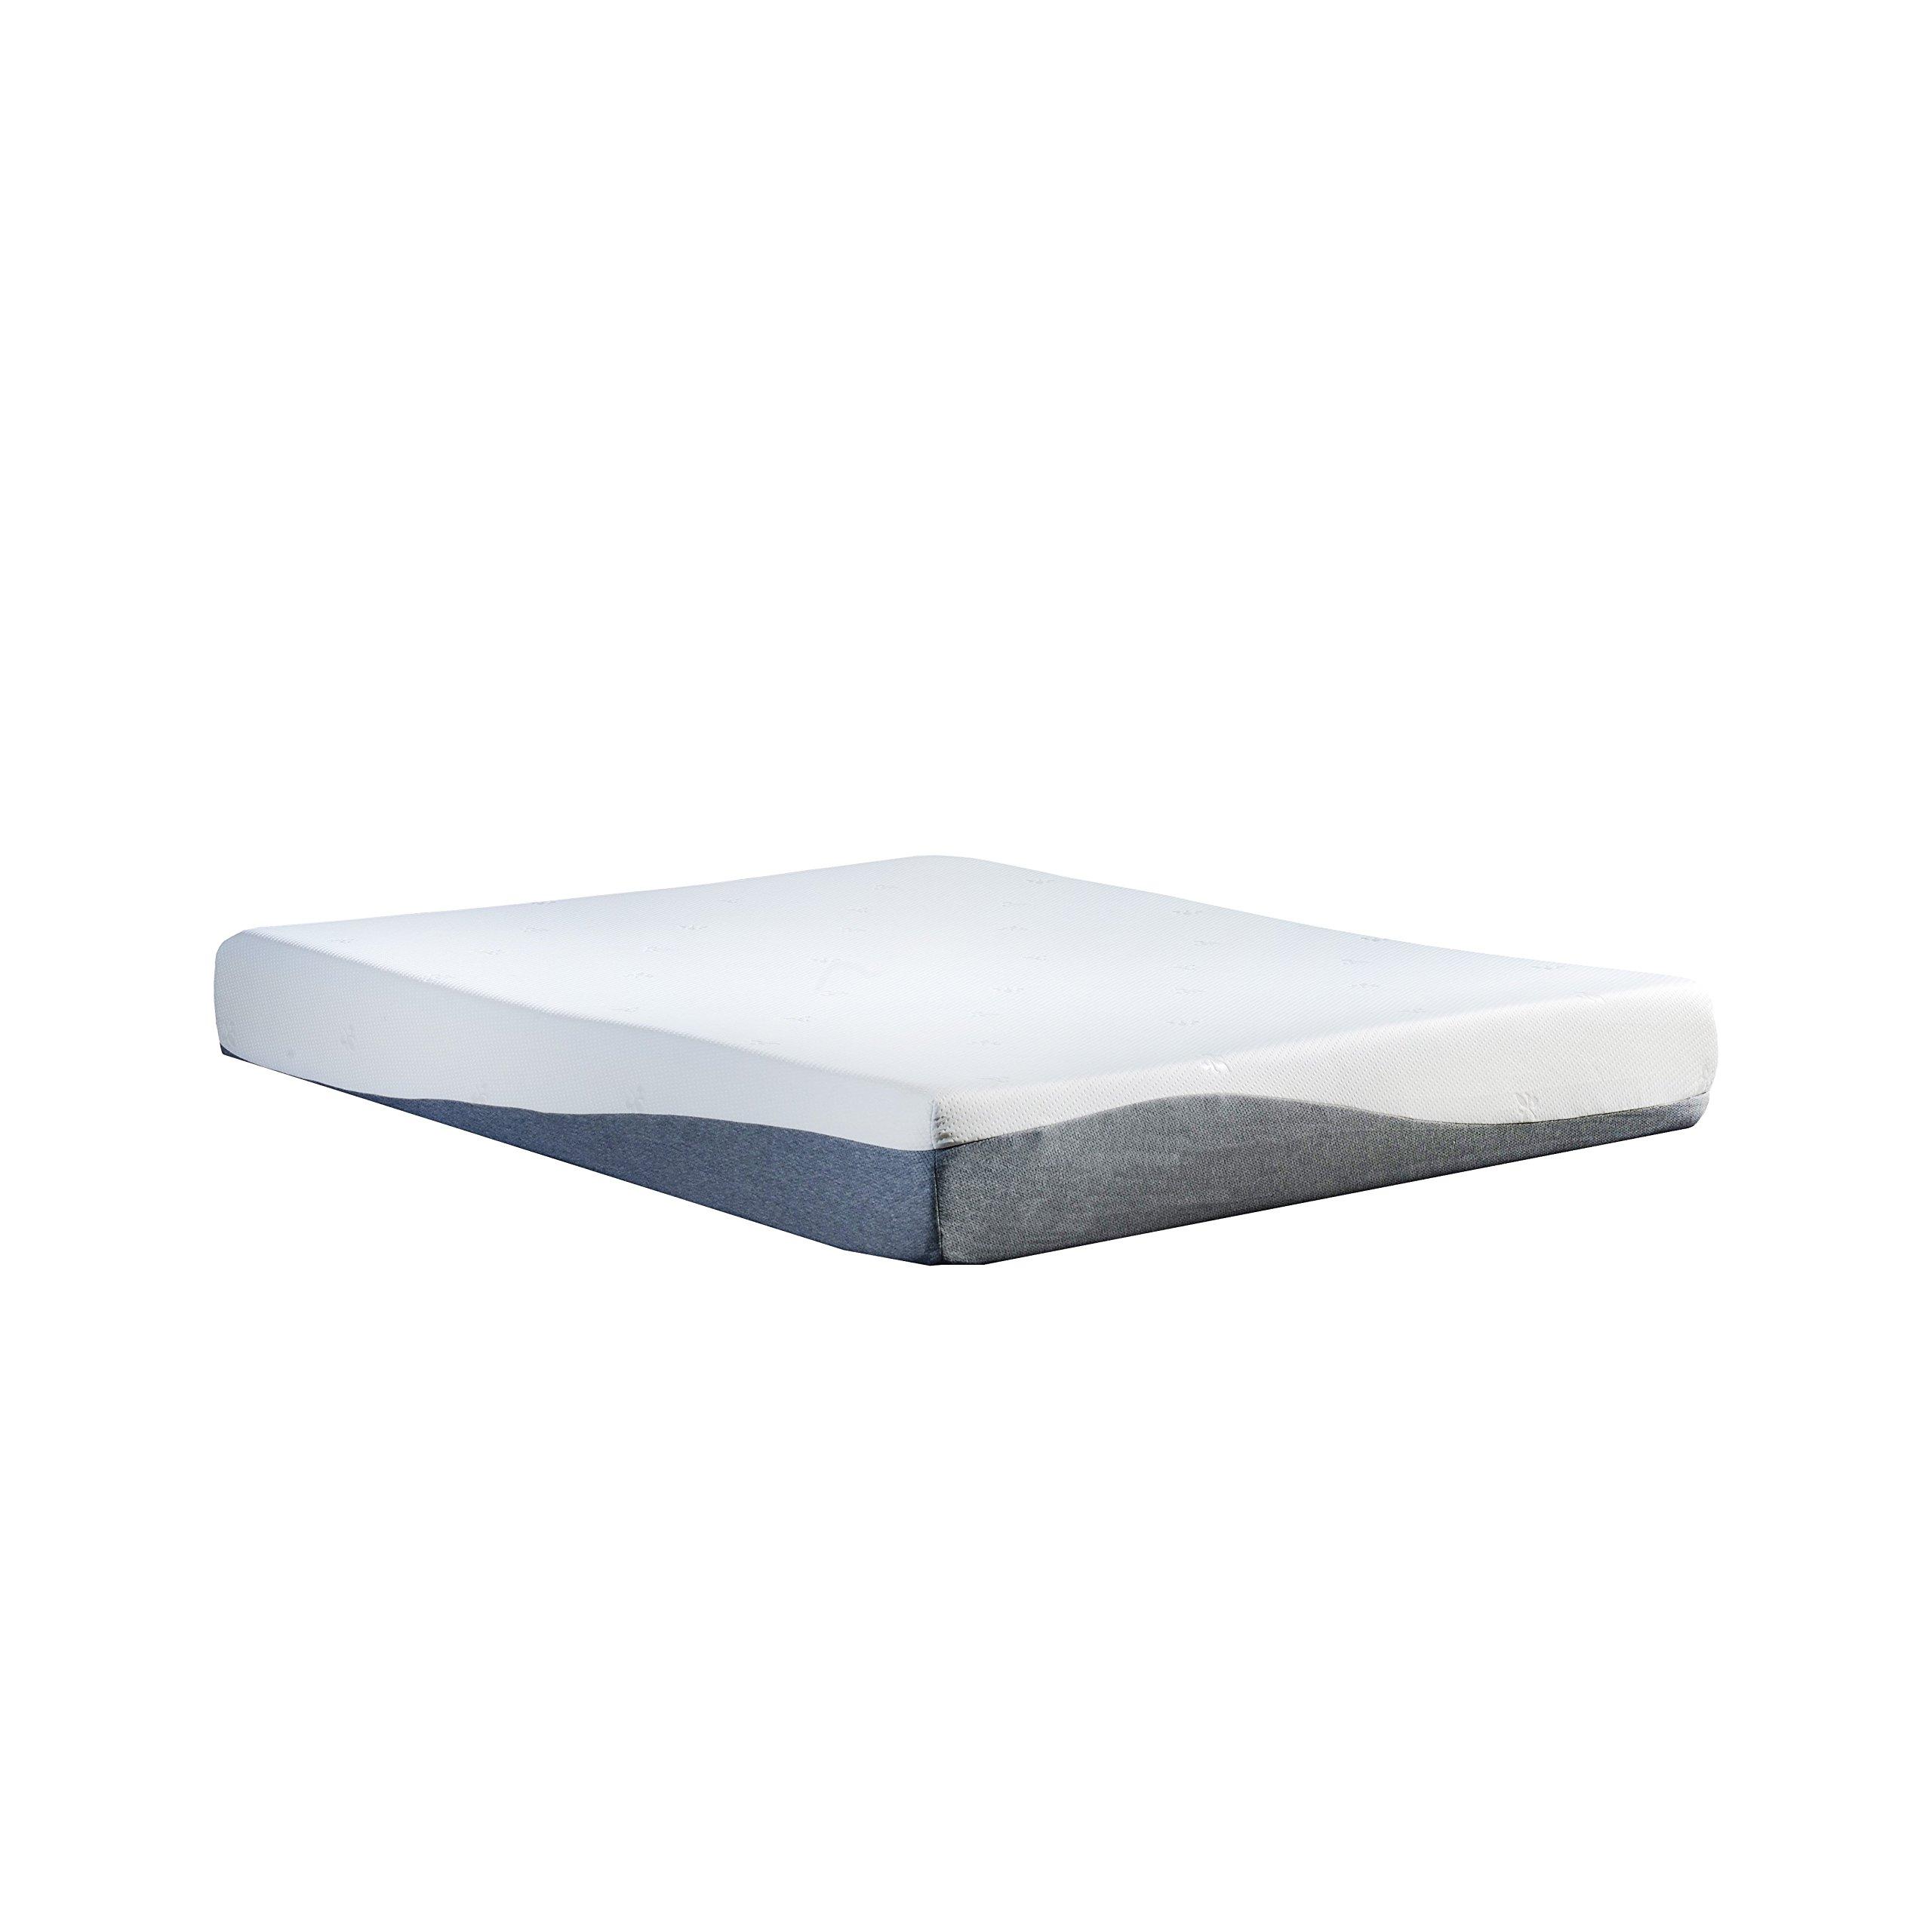 Swiss Ortho Sleep, 10'' High-Density, 3 x Layered GEL & MEMORY FOAM MATTRESS, w/ Bamboo Cover, All Sizes